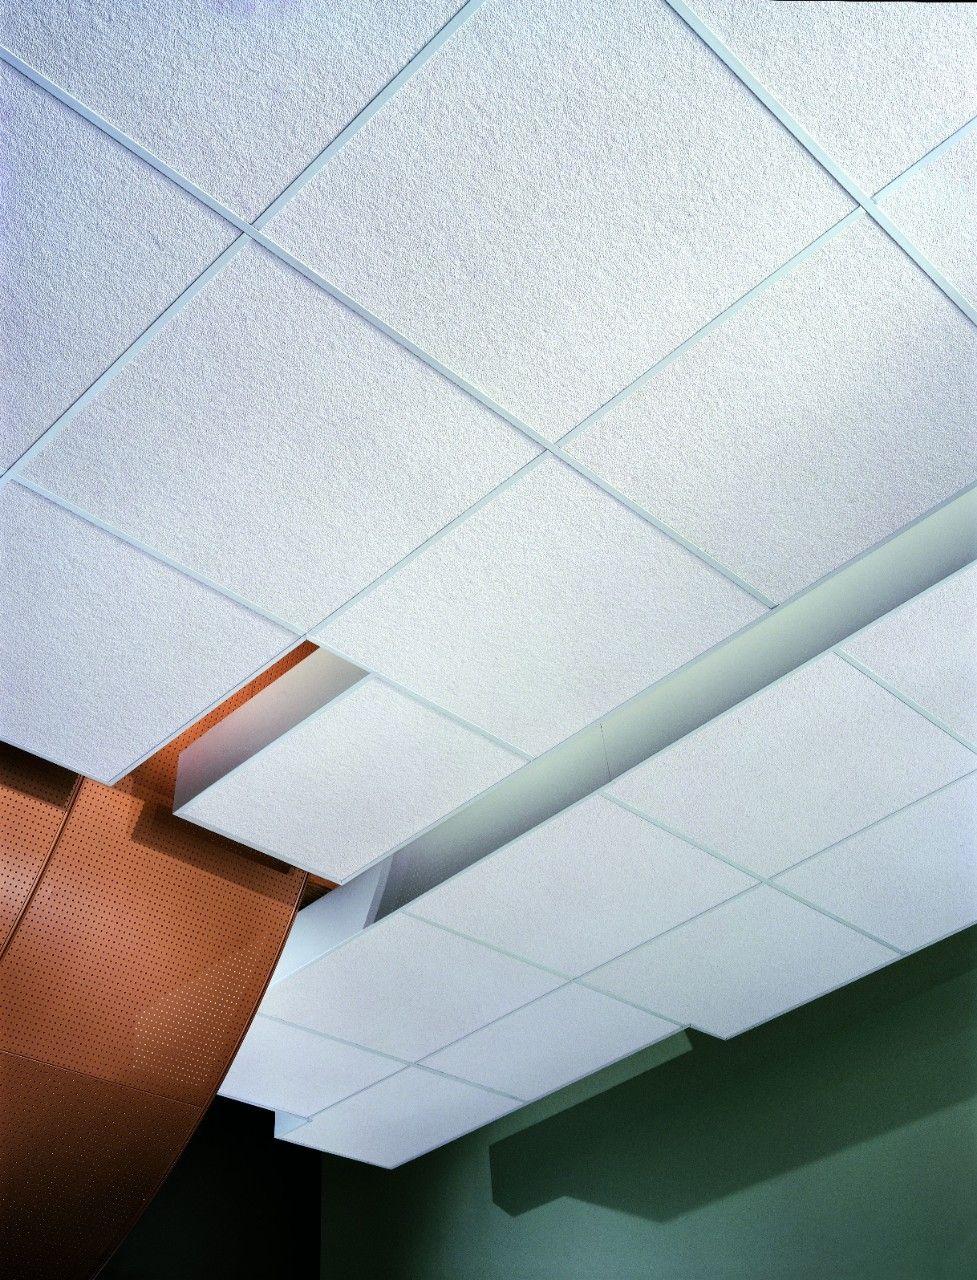 Mildew resistant drop ceiling tiles httpcreativechairsandtables mildew resistant drop ceiling tiles dailygadgetfo Images